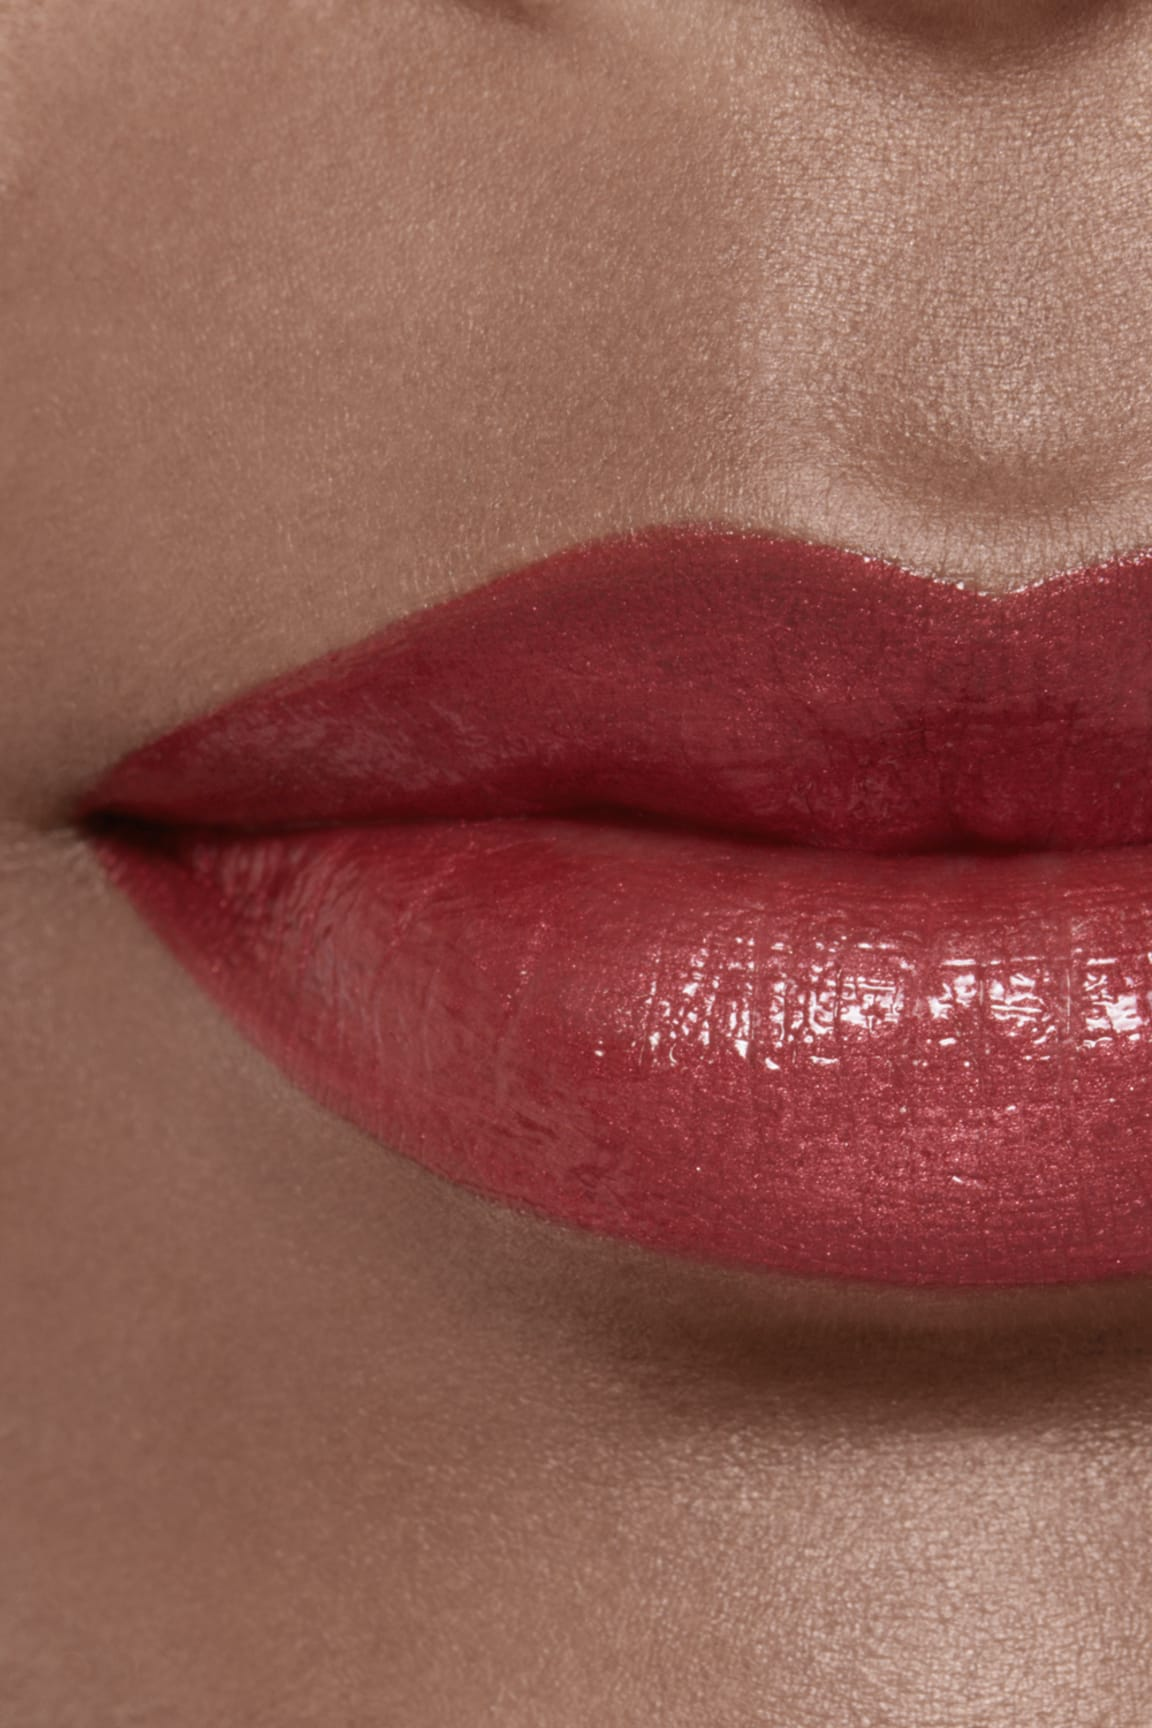 Application makeup visual 2 - ROUGE ALLURE LAQUE 84 - ROSE AMBIGU